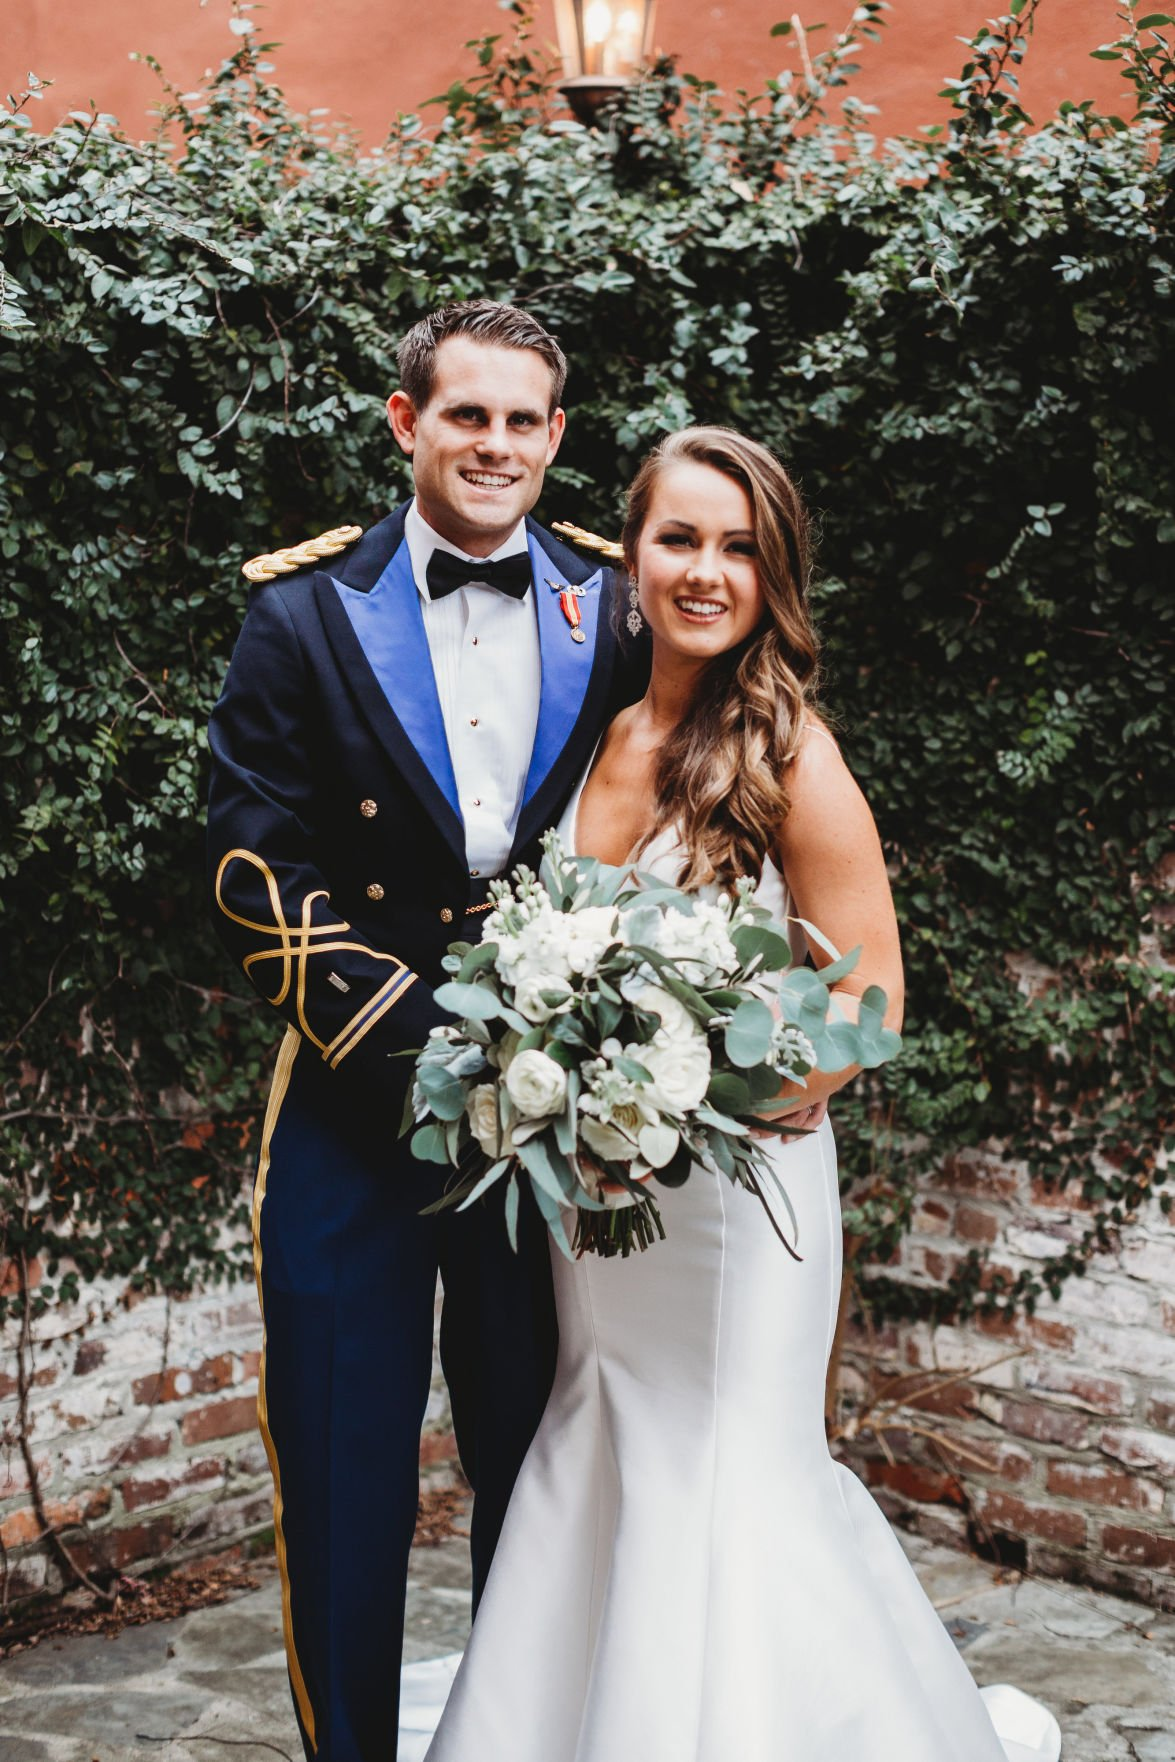 Belden, Hooker Wedding | Weddings Engagements | dothaneagle.com